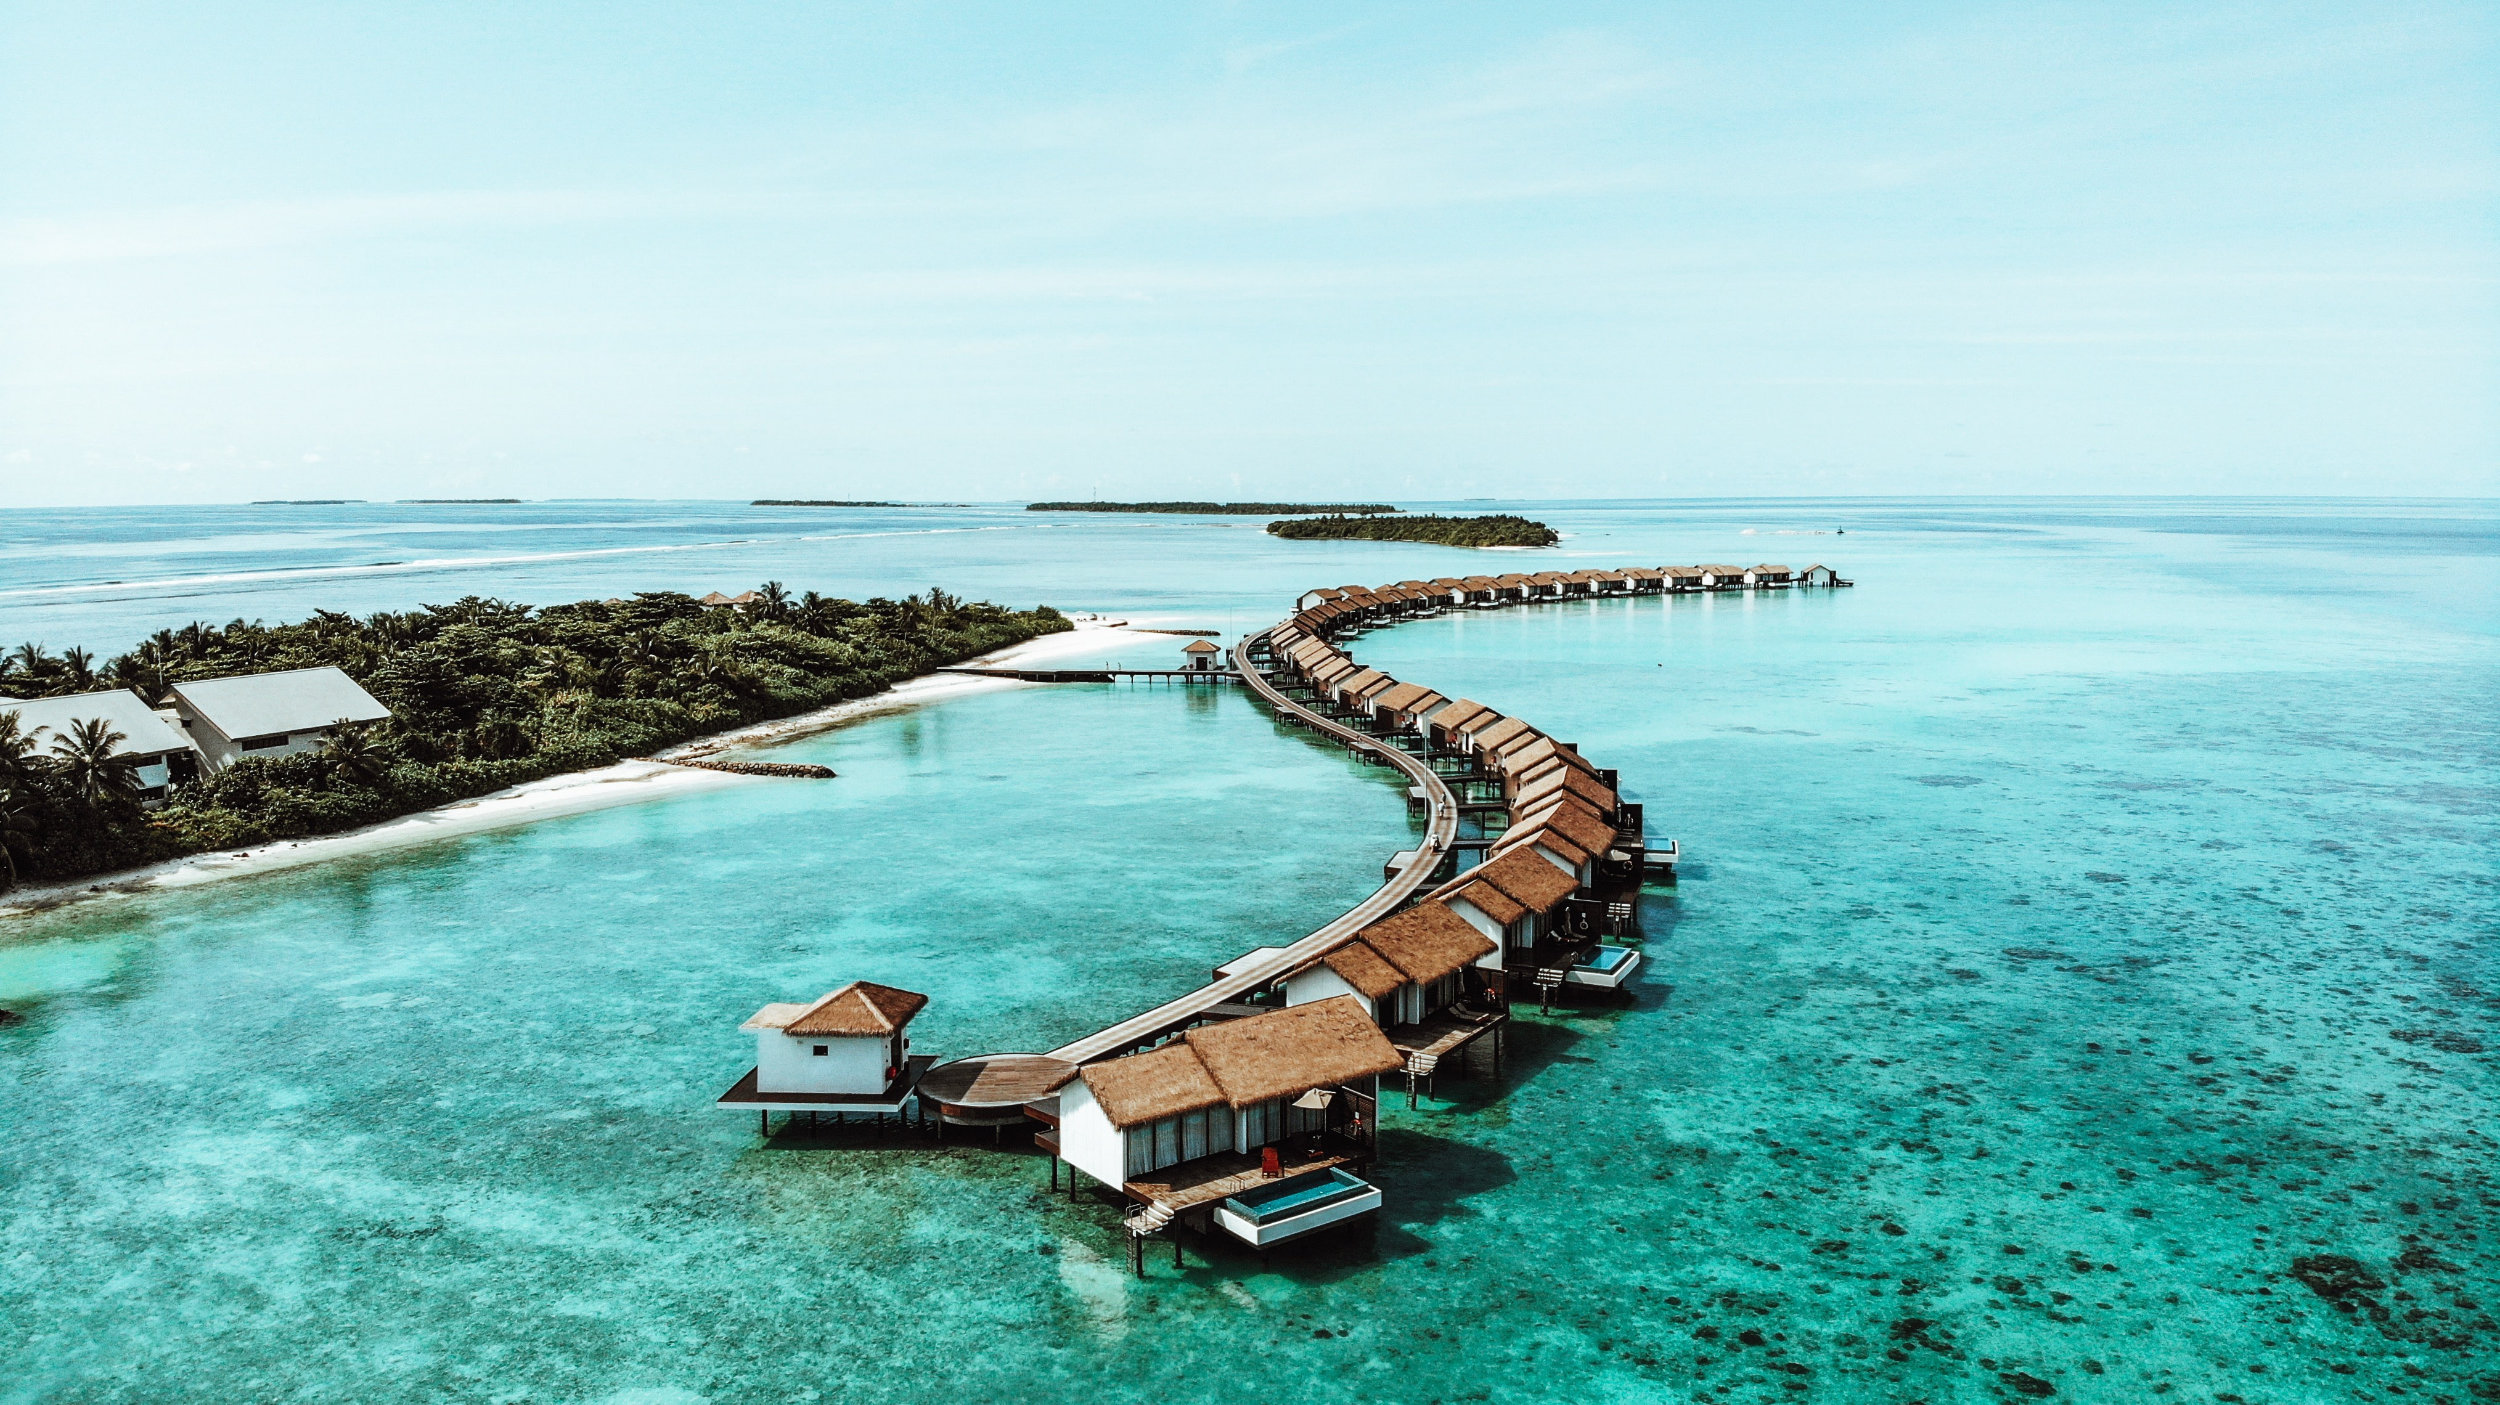 The Residence Maldives Wasservillen